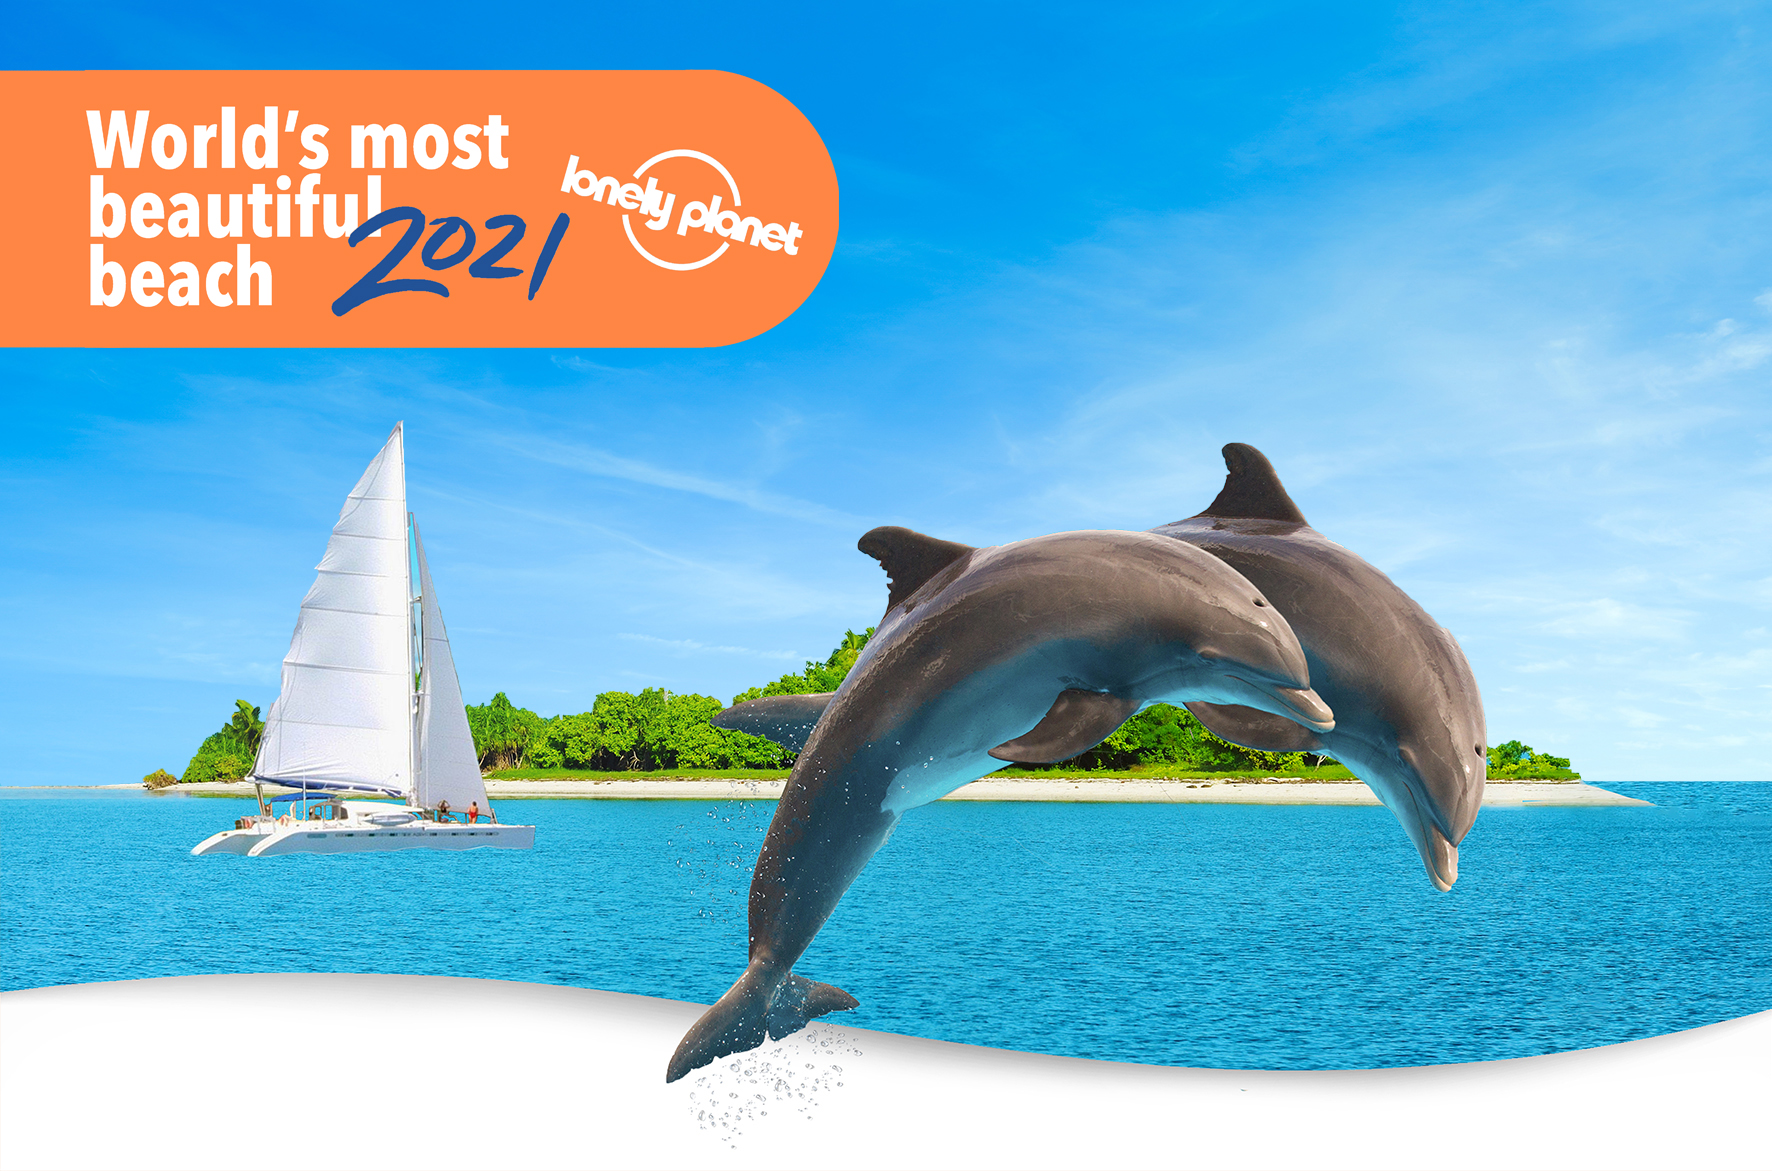 Dolphin WP LP7